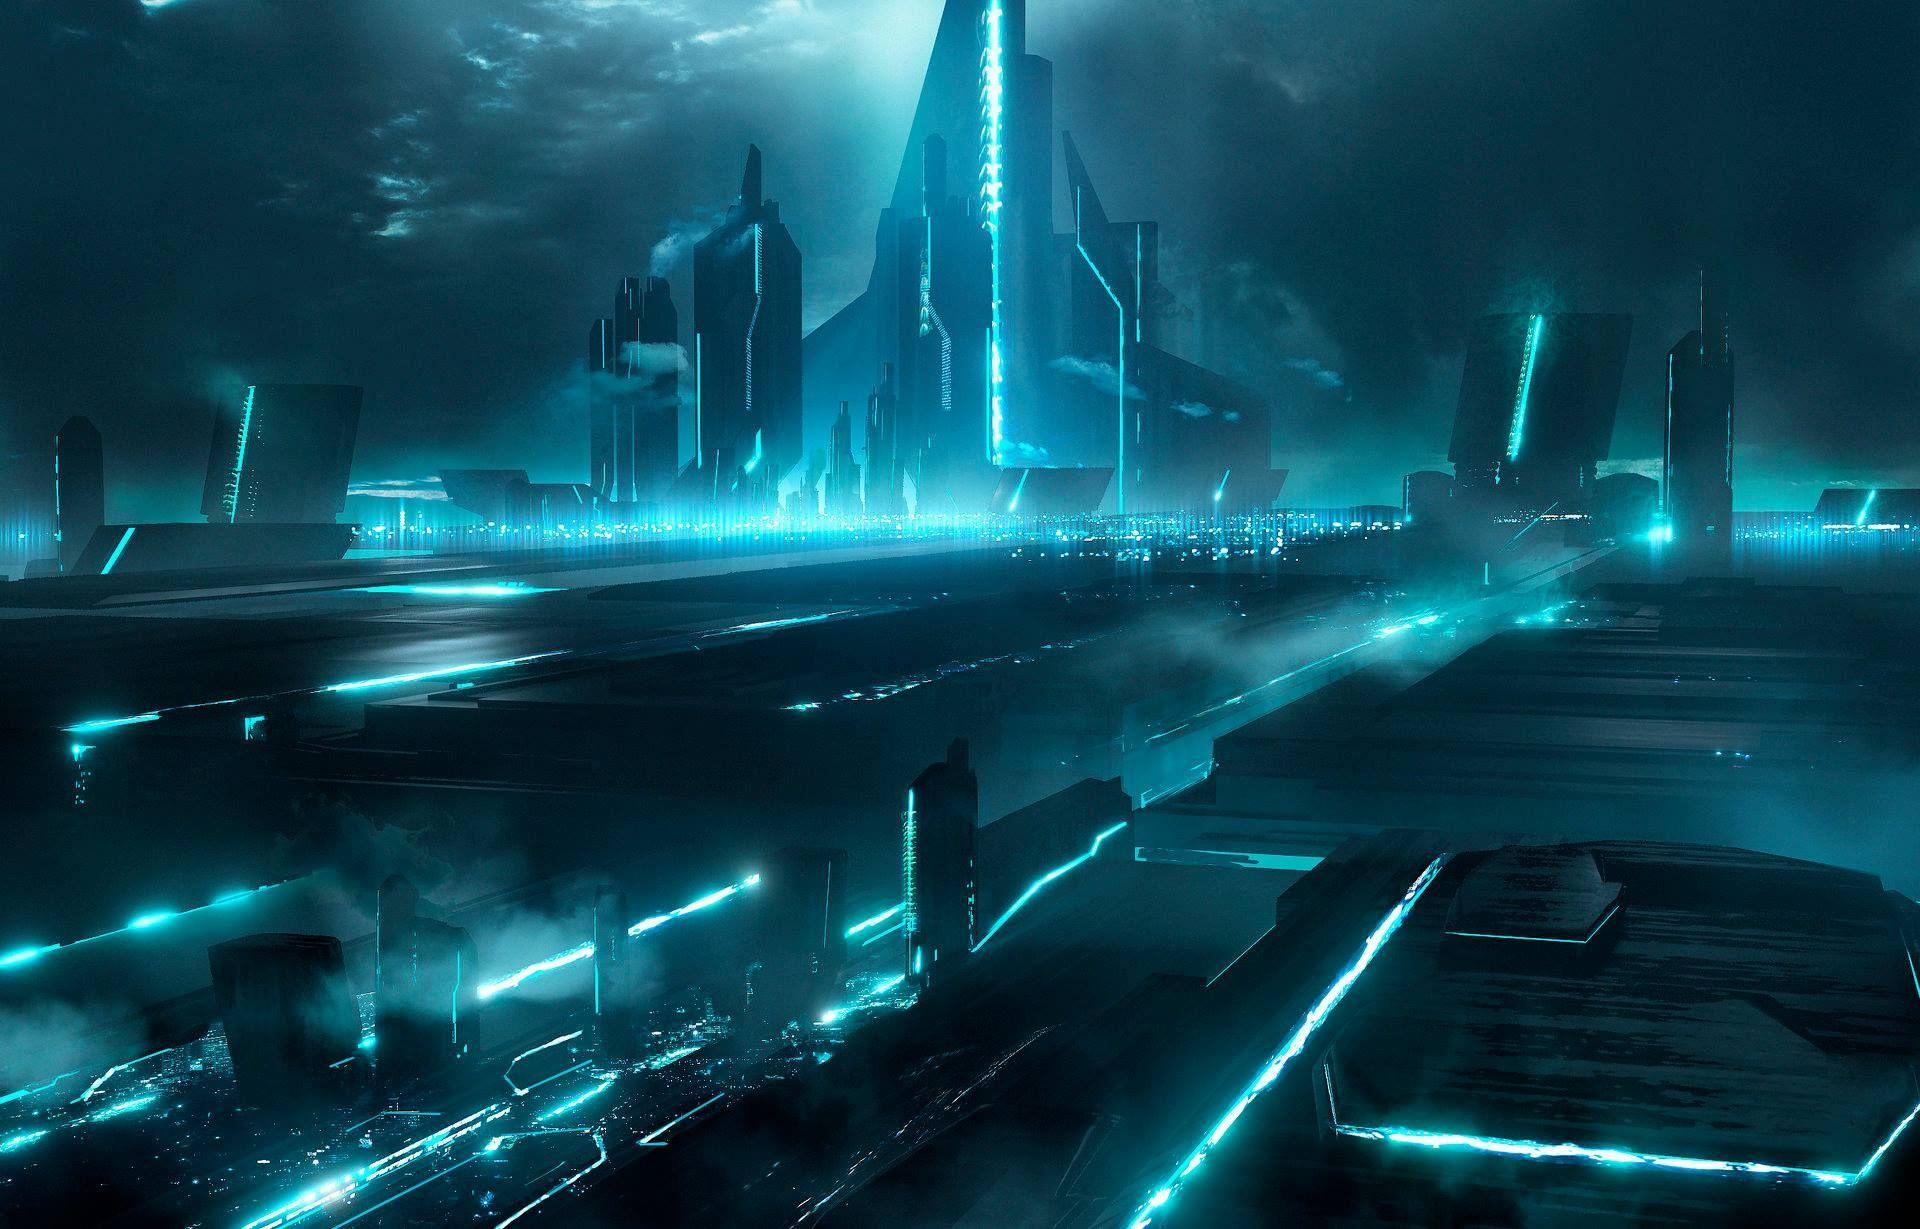 12977072 1099223853467388 6525159195171707138 O Jpg 1920 1229 Fantasy City Tron Futuristic City